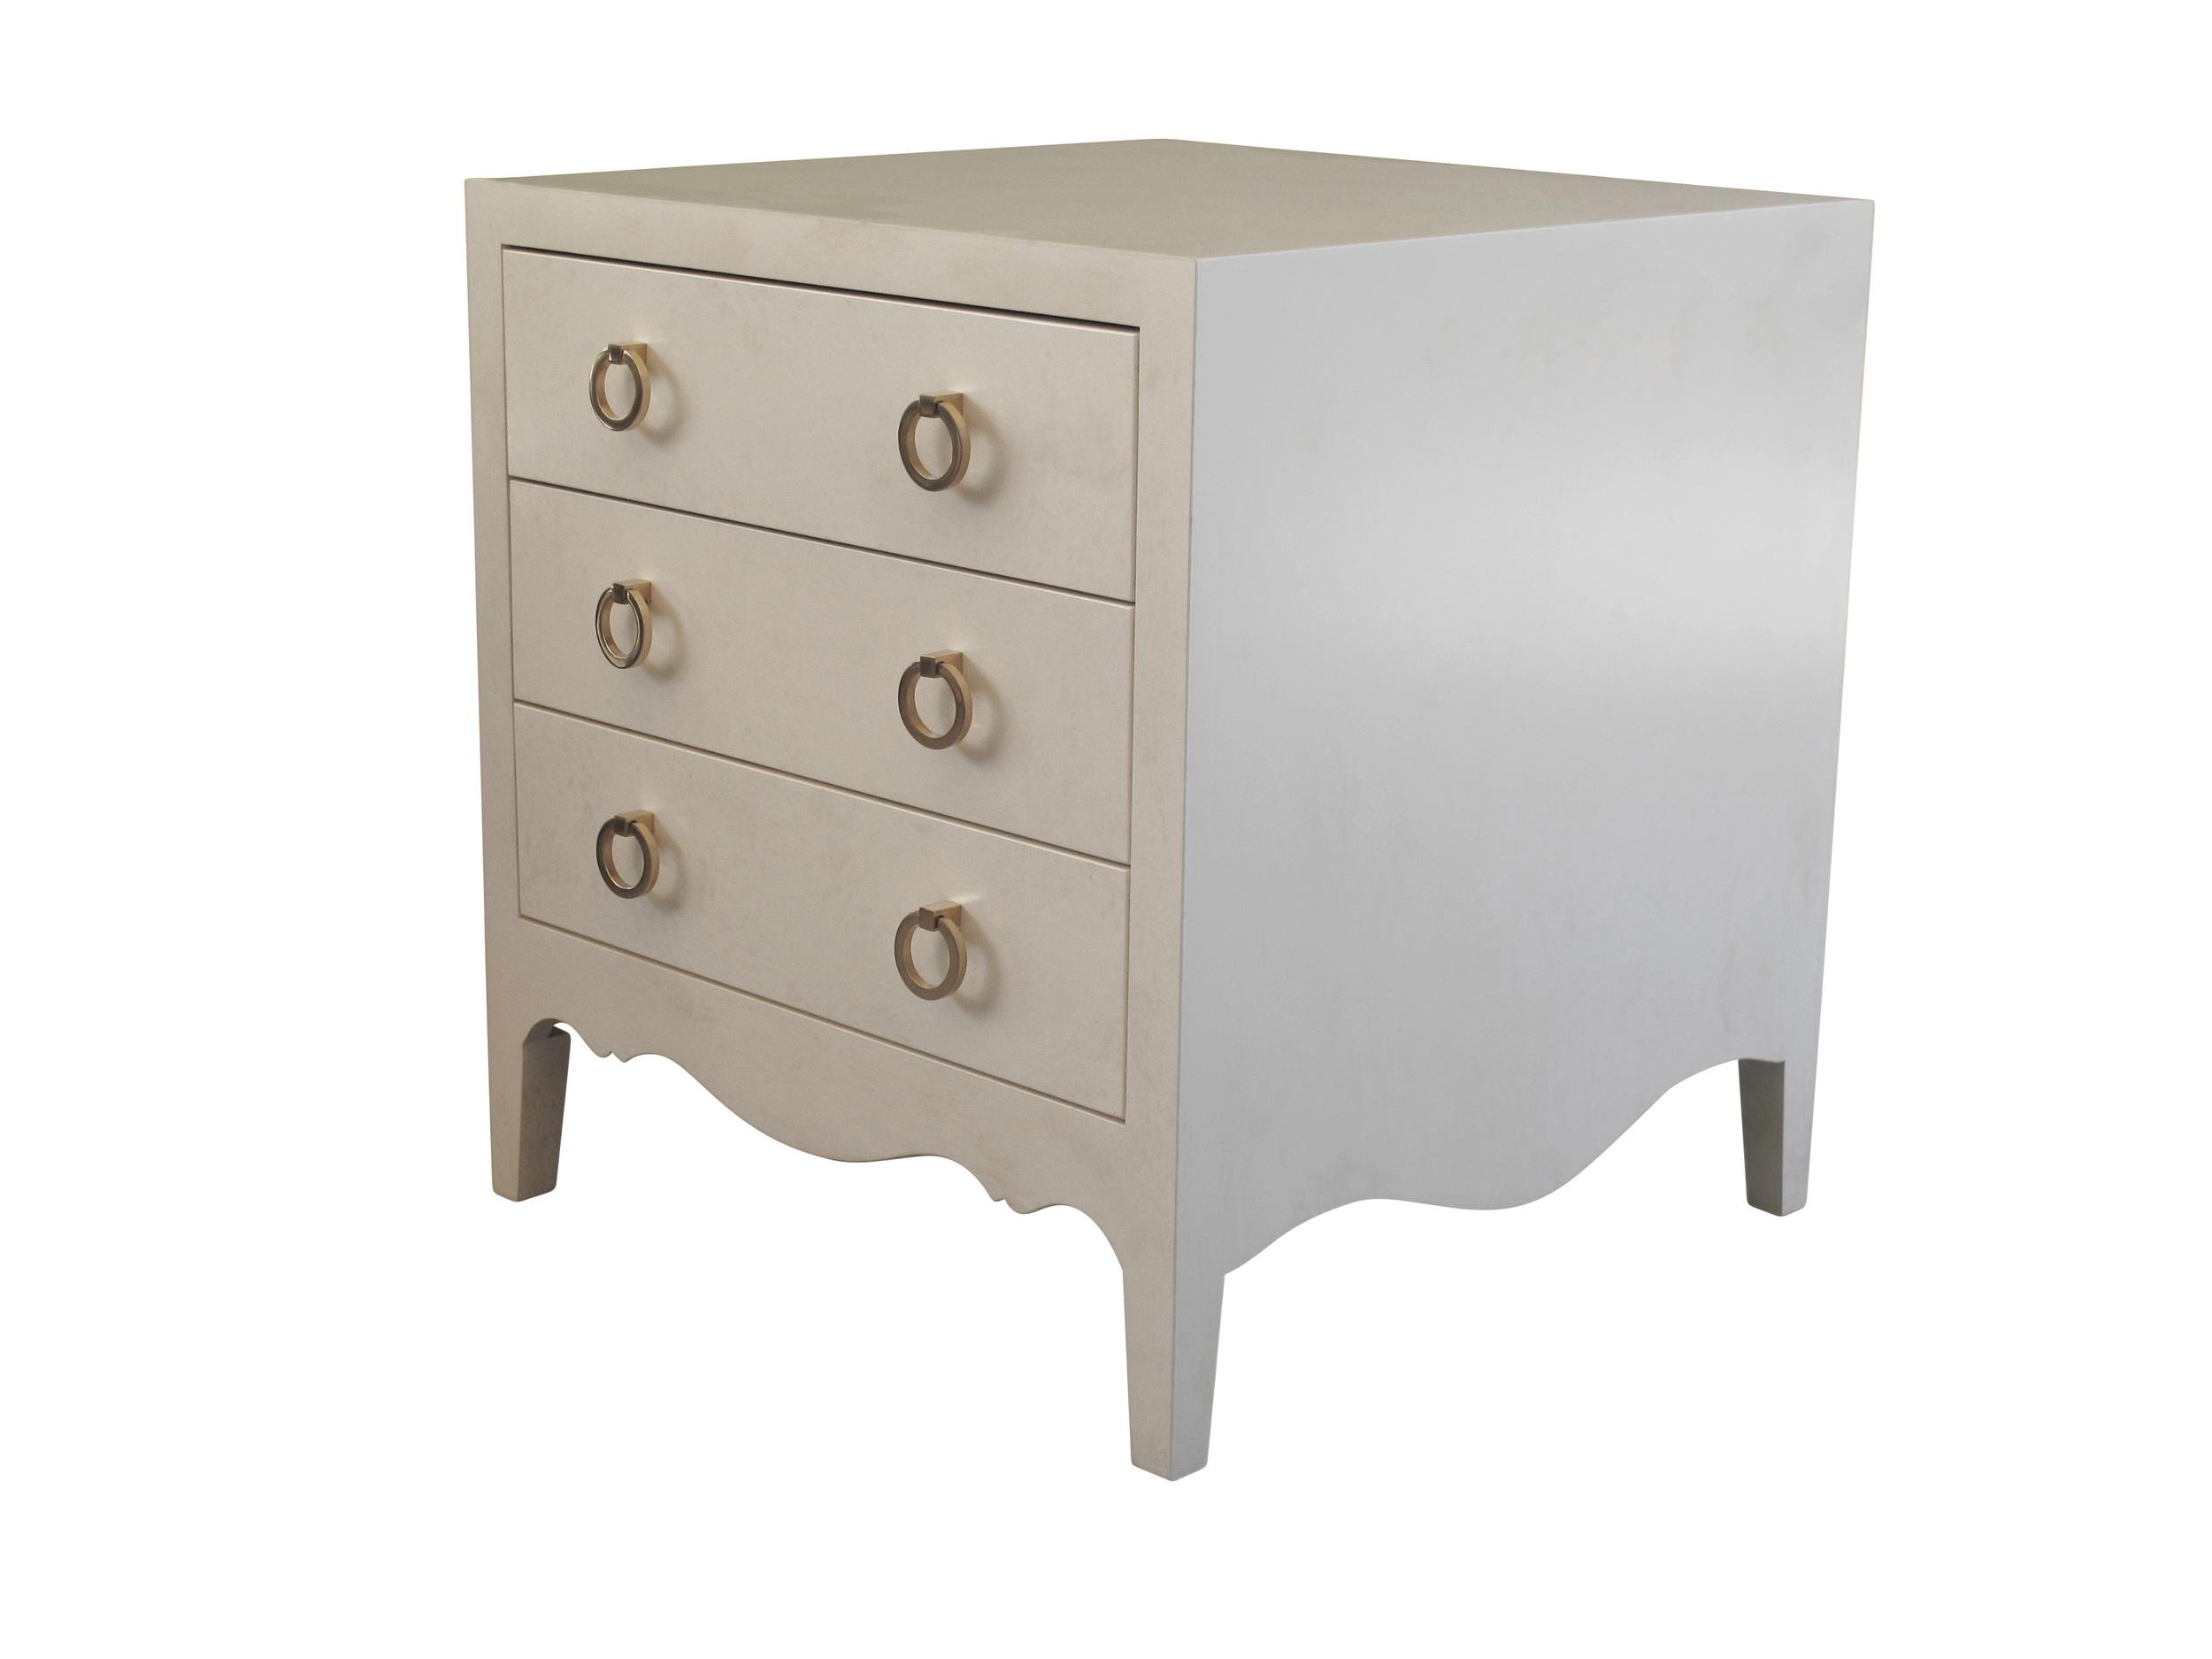 MARCY Dresser